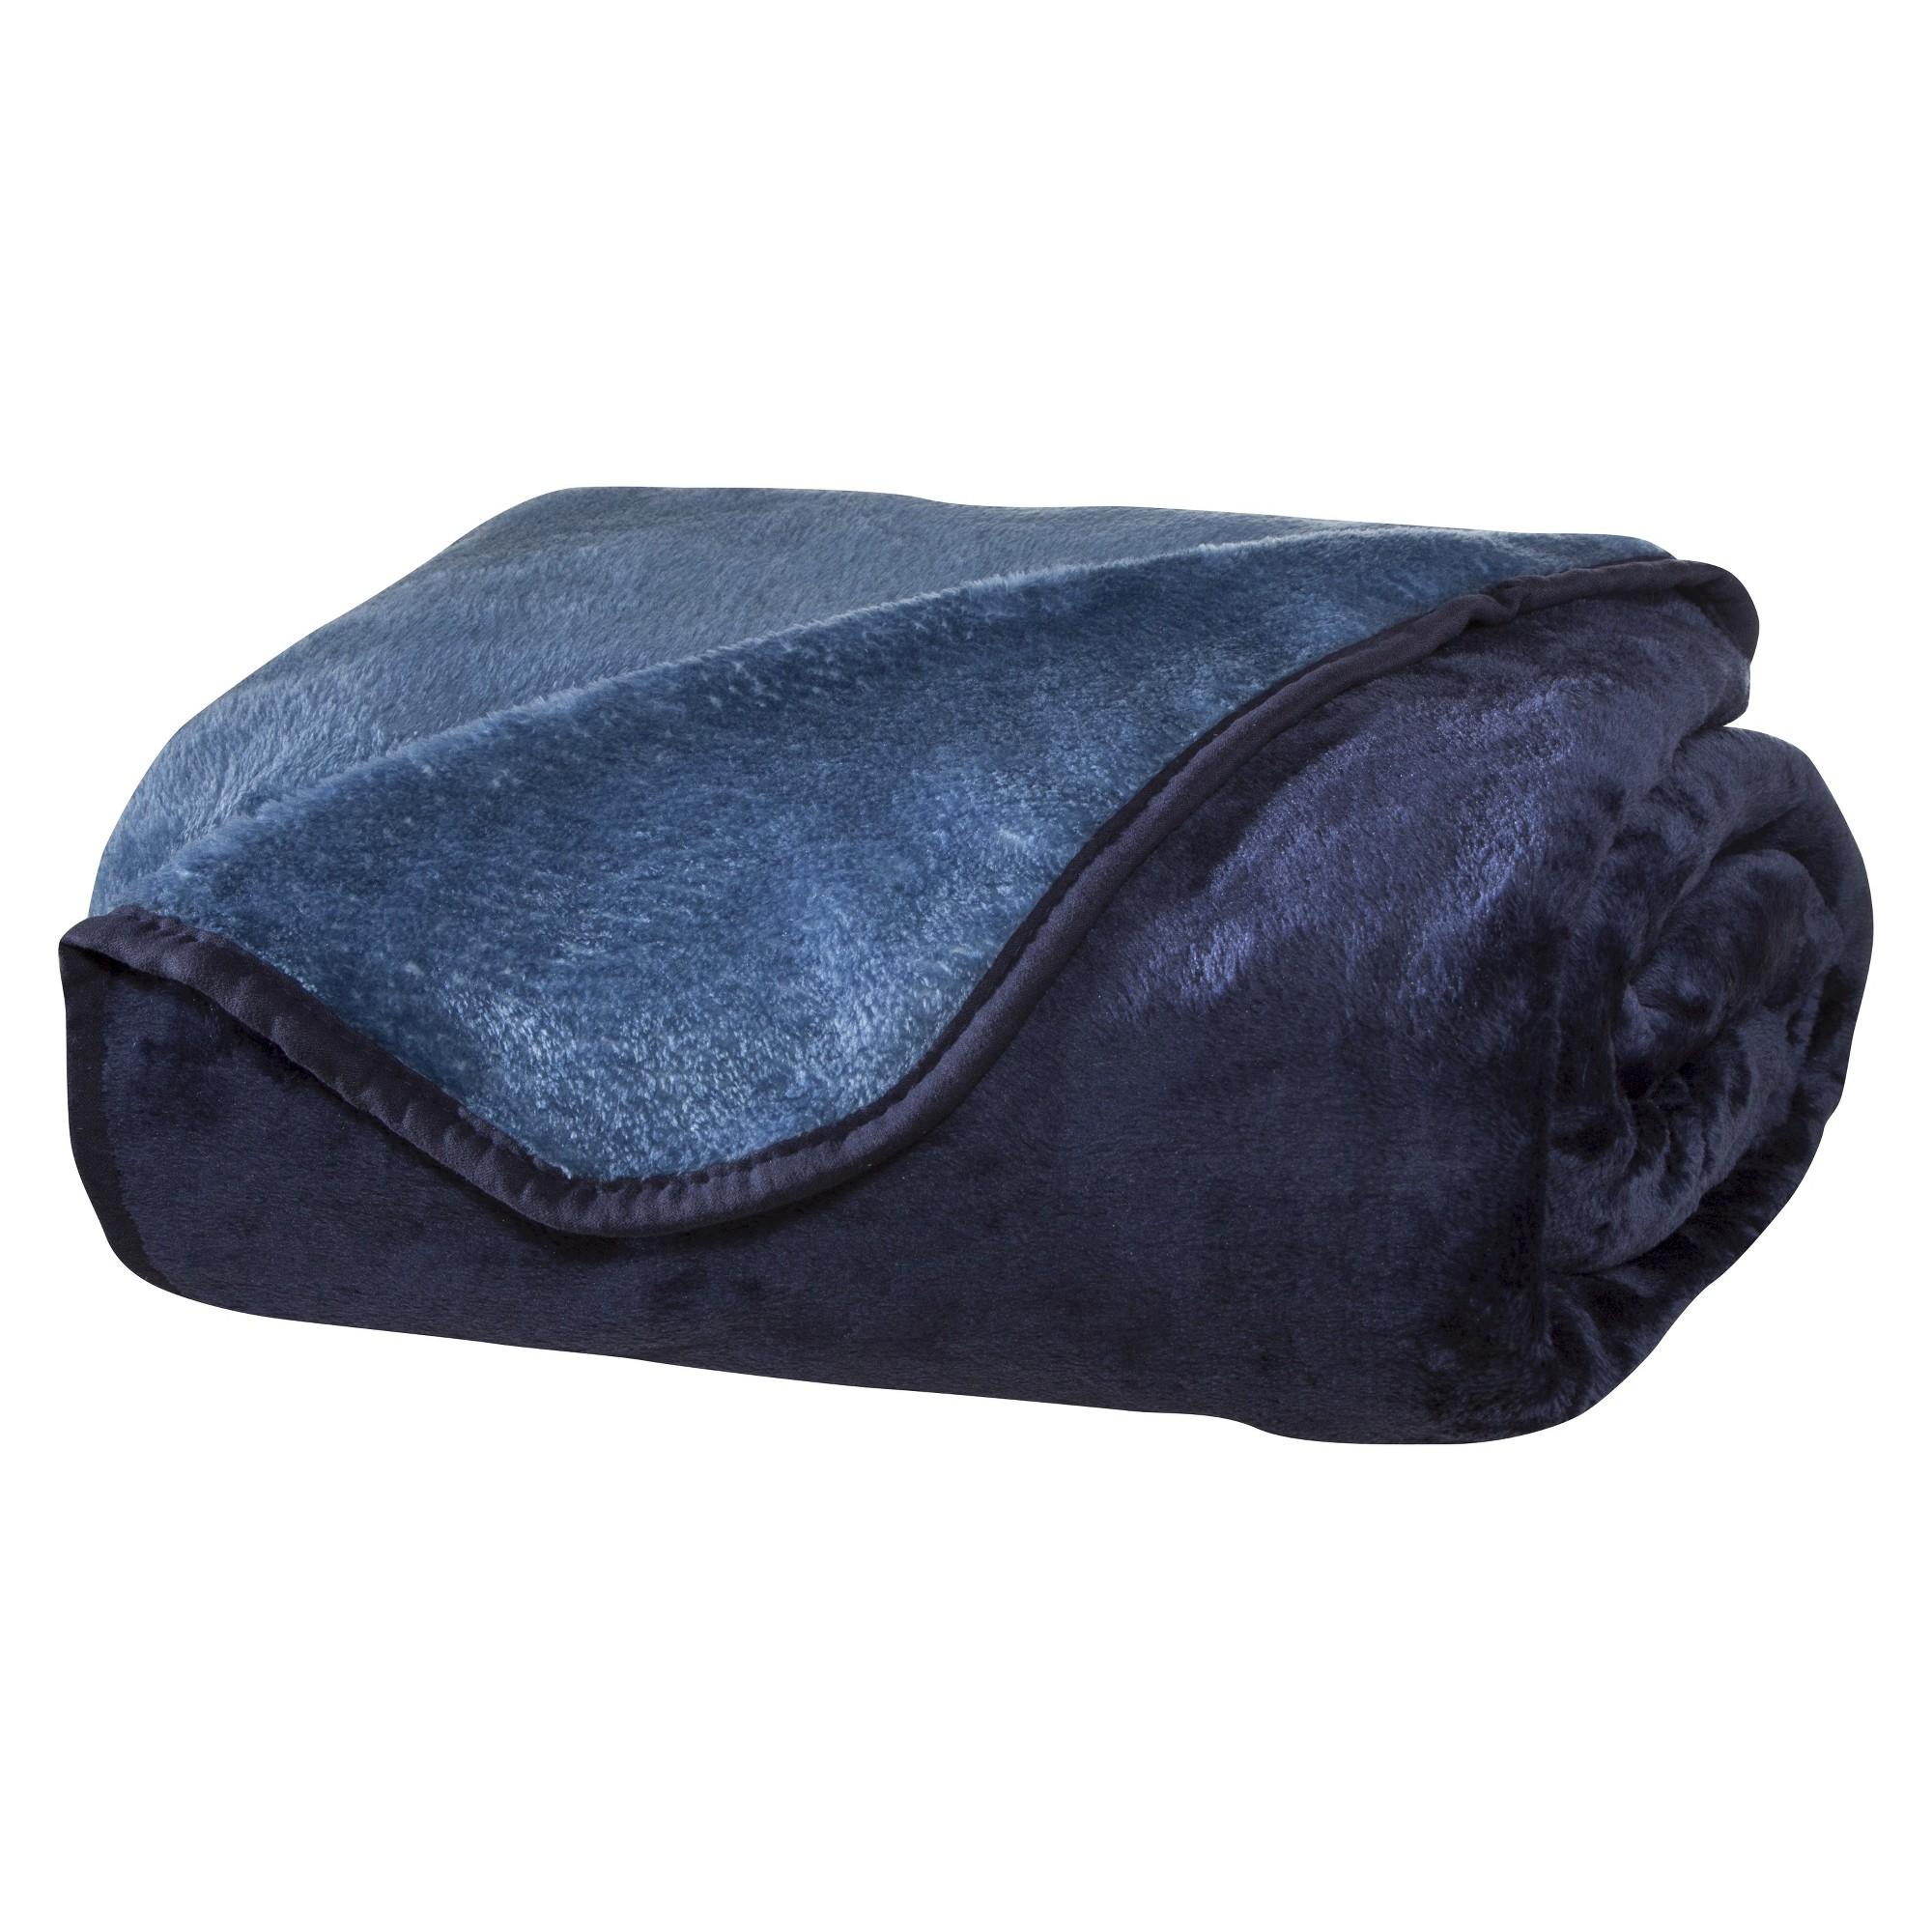 All Seasons Reversible Plush Blanket (Twin) Blue/Light Blue, Blue & Lt Blue